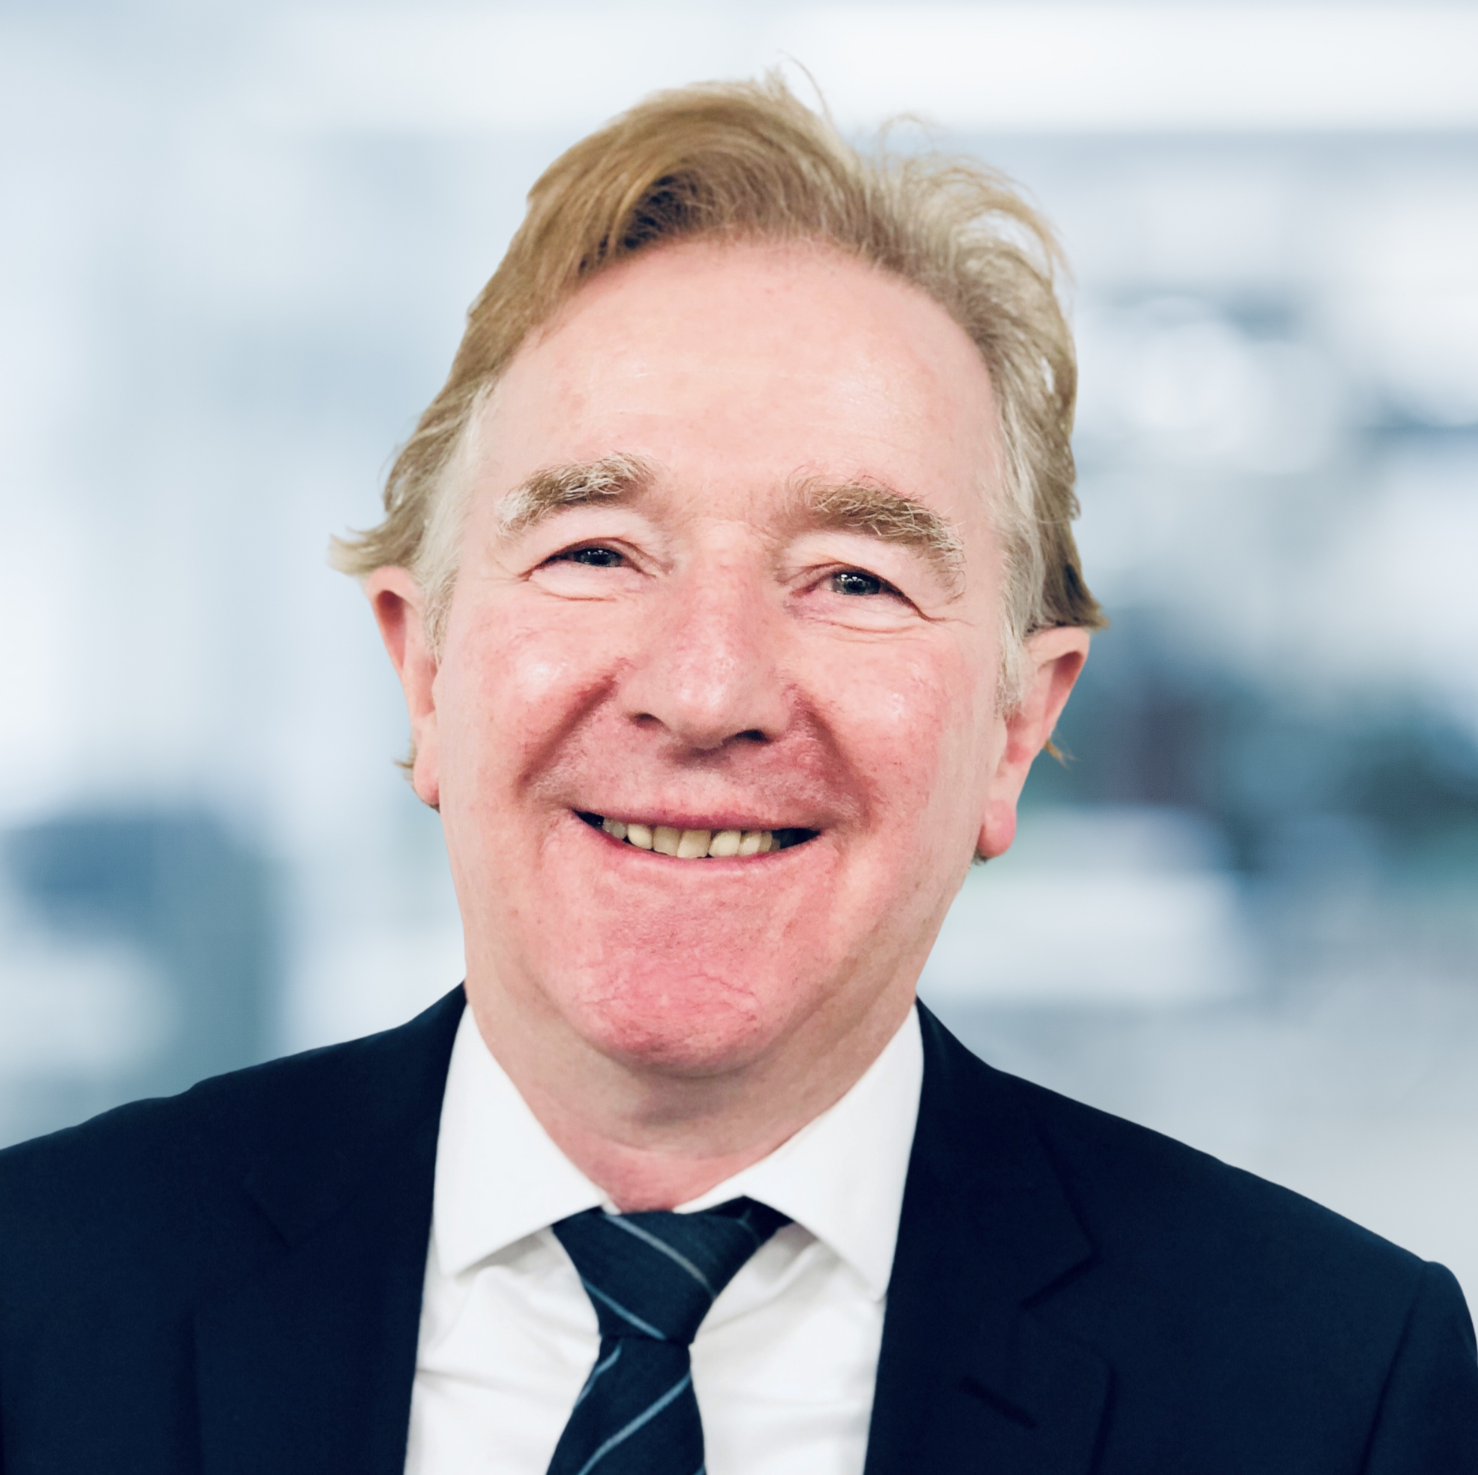 Simon Leak Mortgage Adviser Evolution Financial Services & Executive Mortgages Teddington